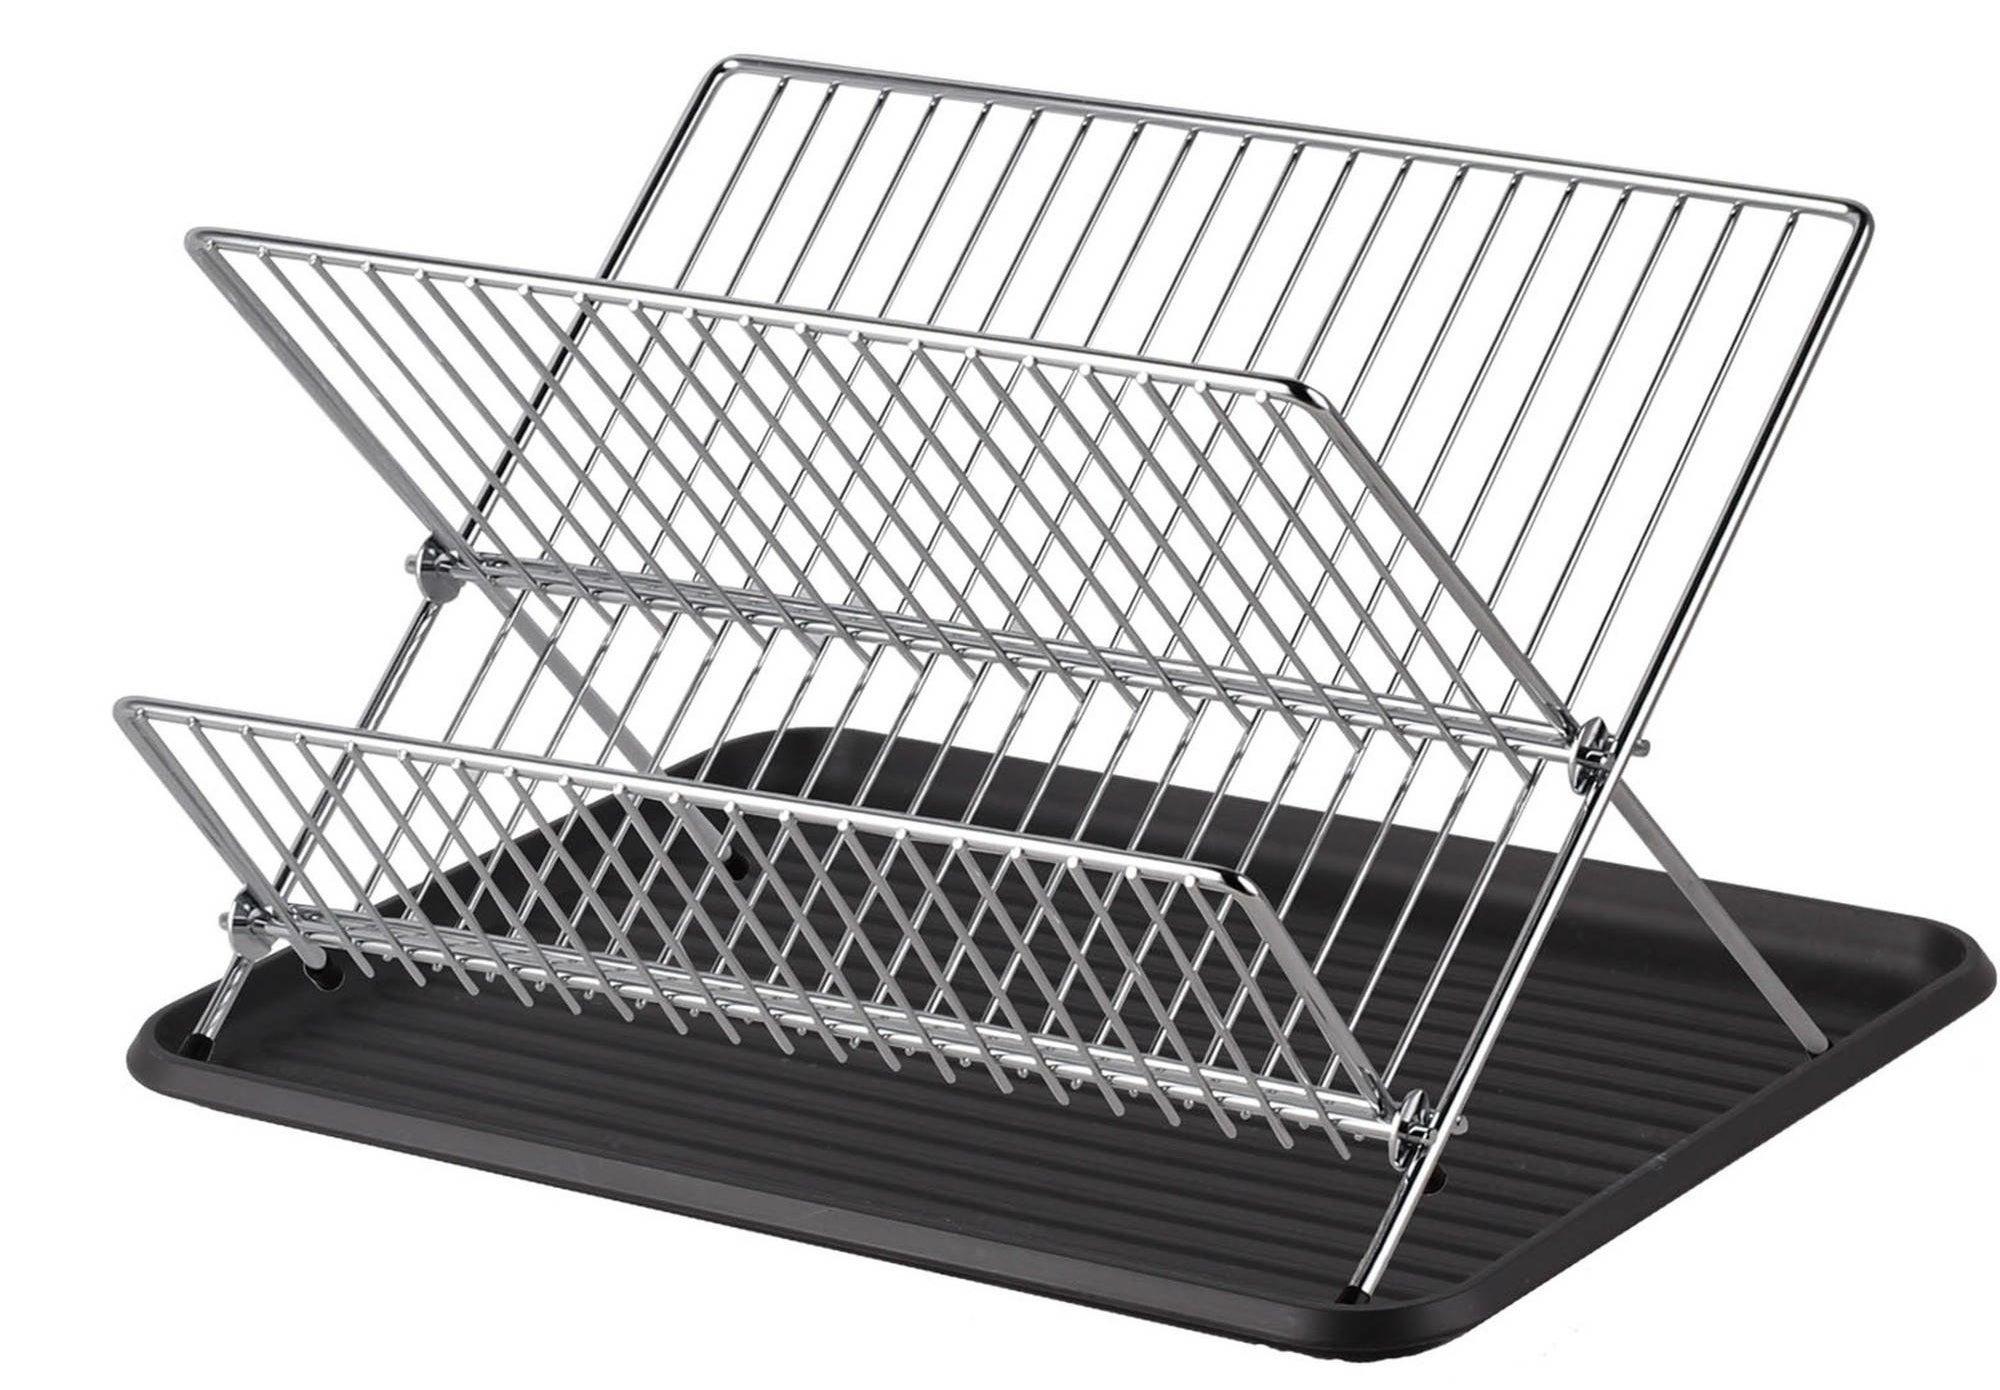 A folding dish rack set